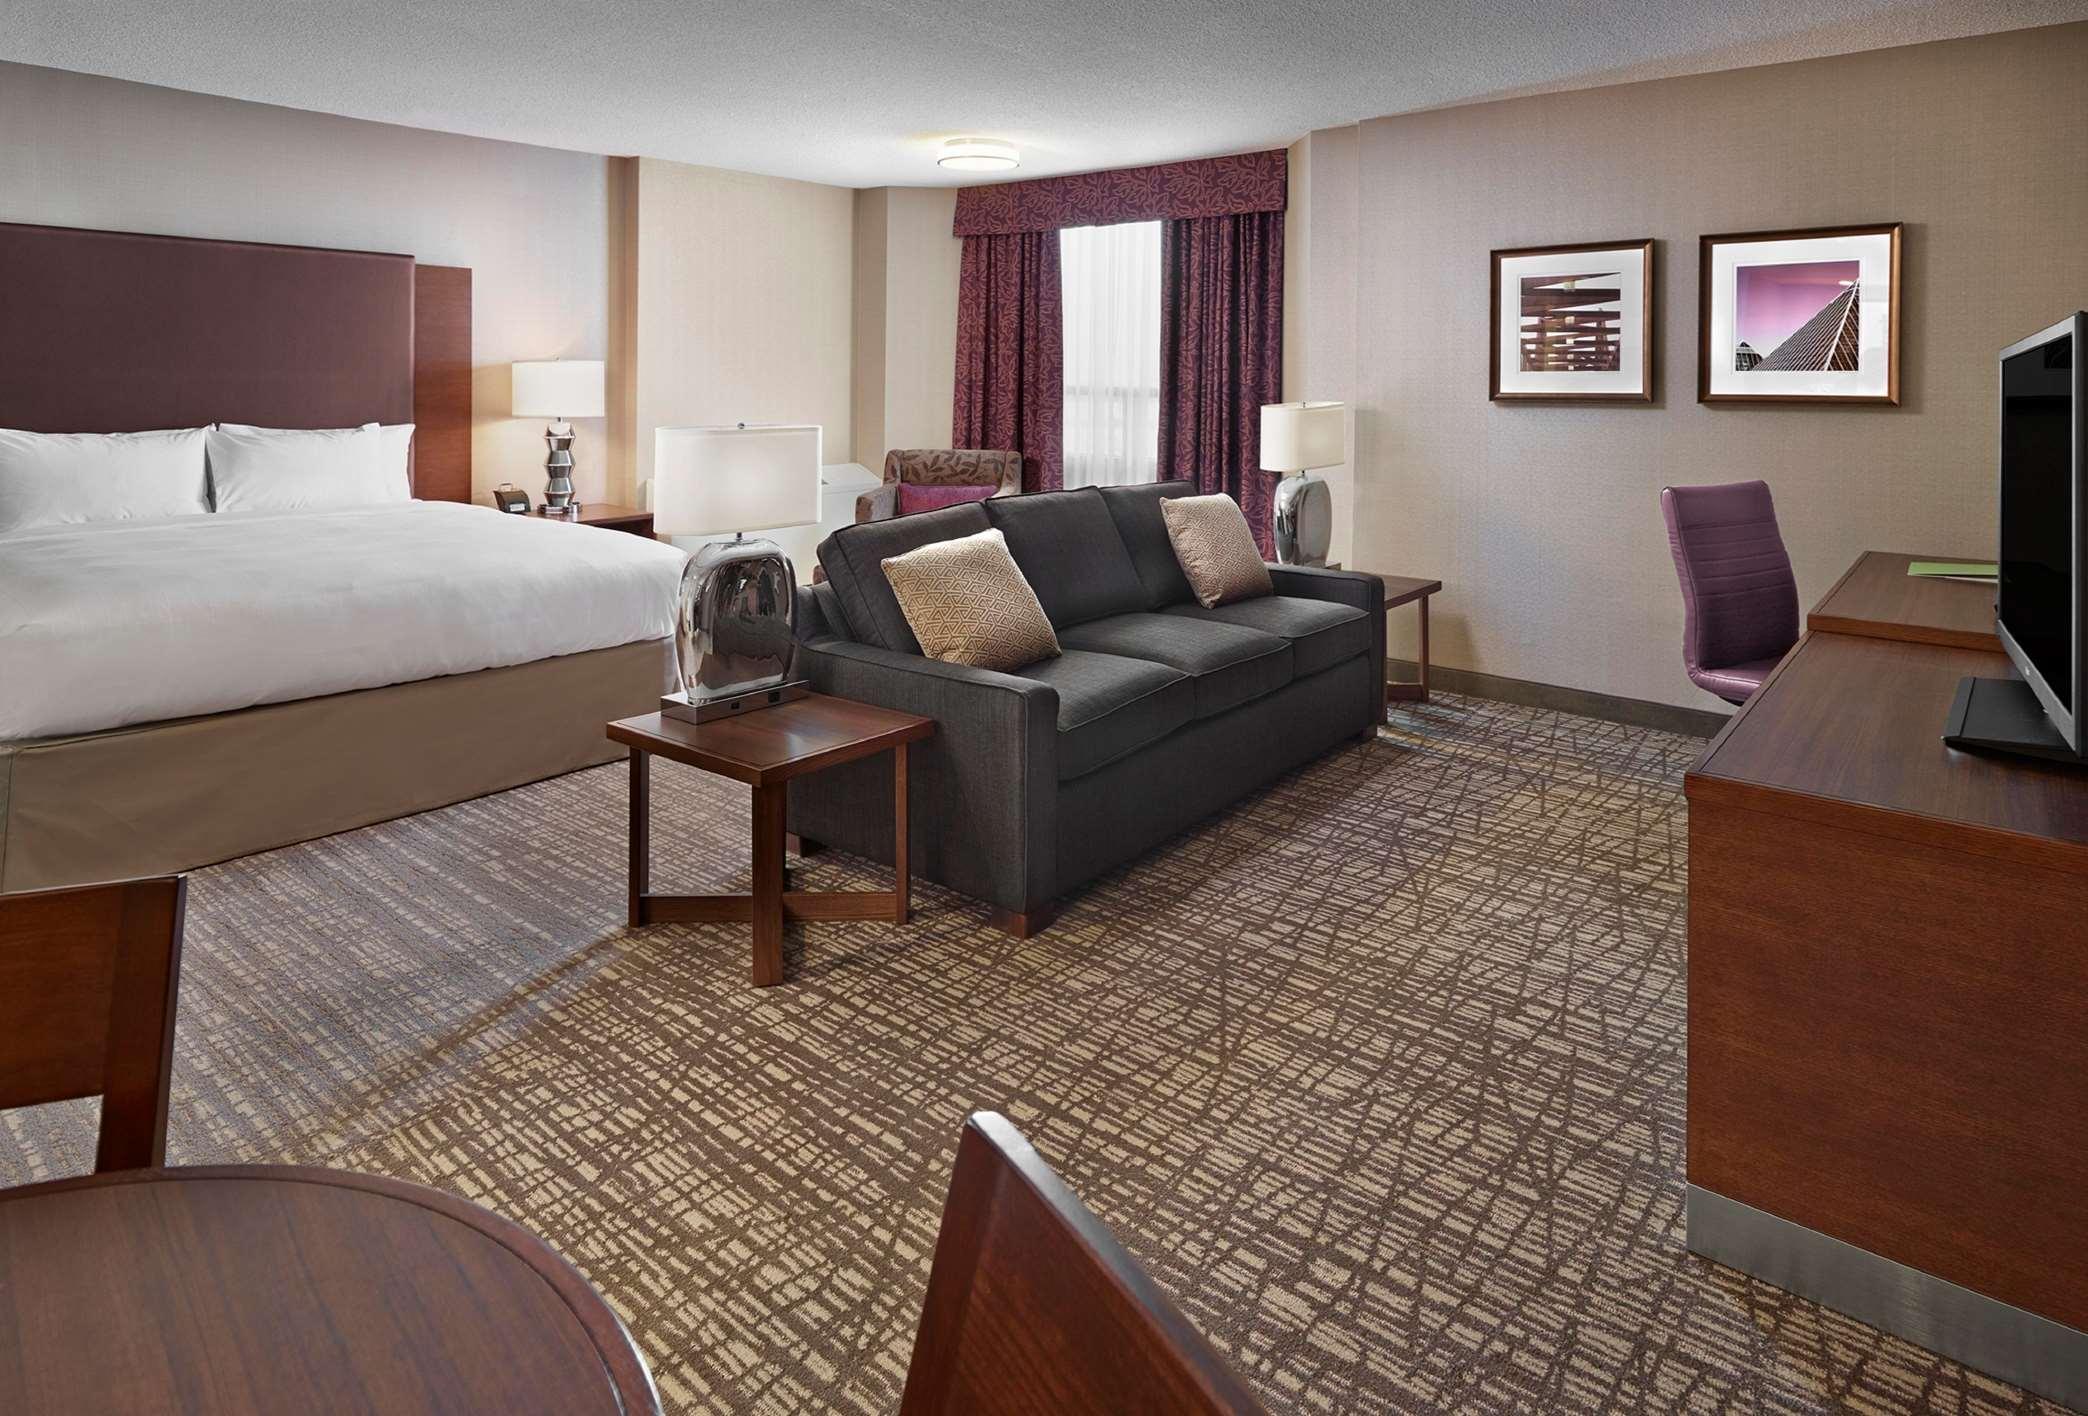 DoubleTree by Hilton Hotel West Edmonton in Edmonton: Junior Suite